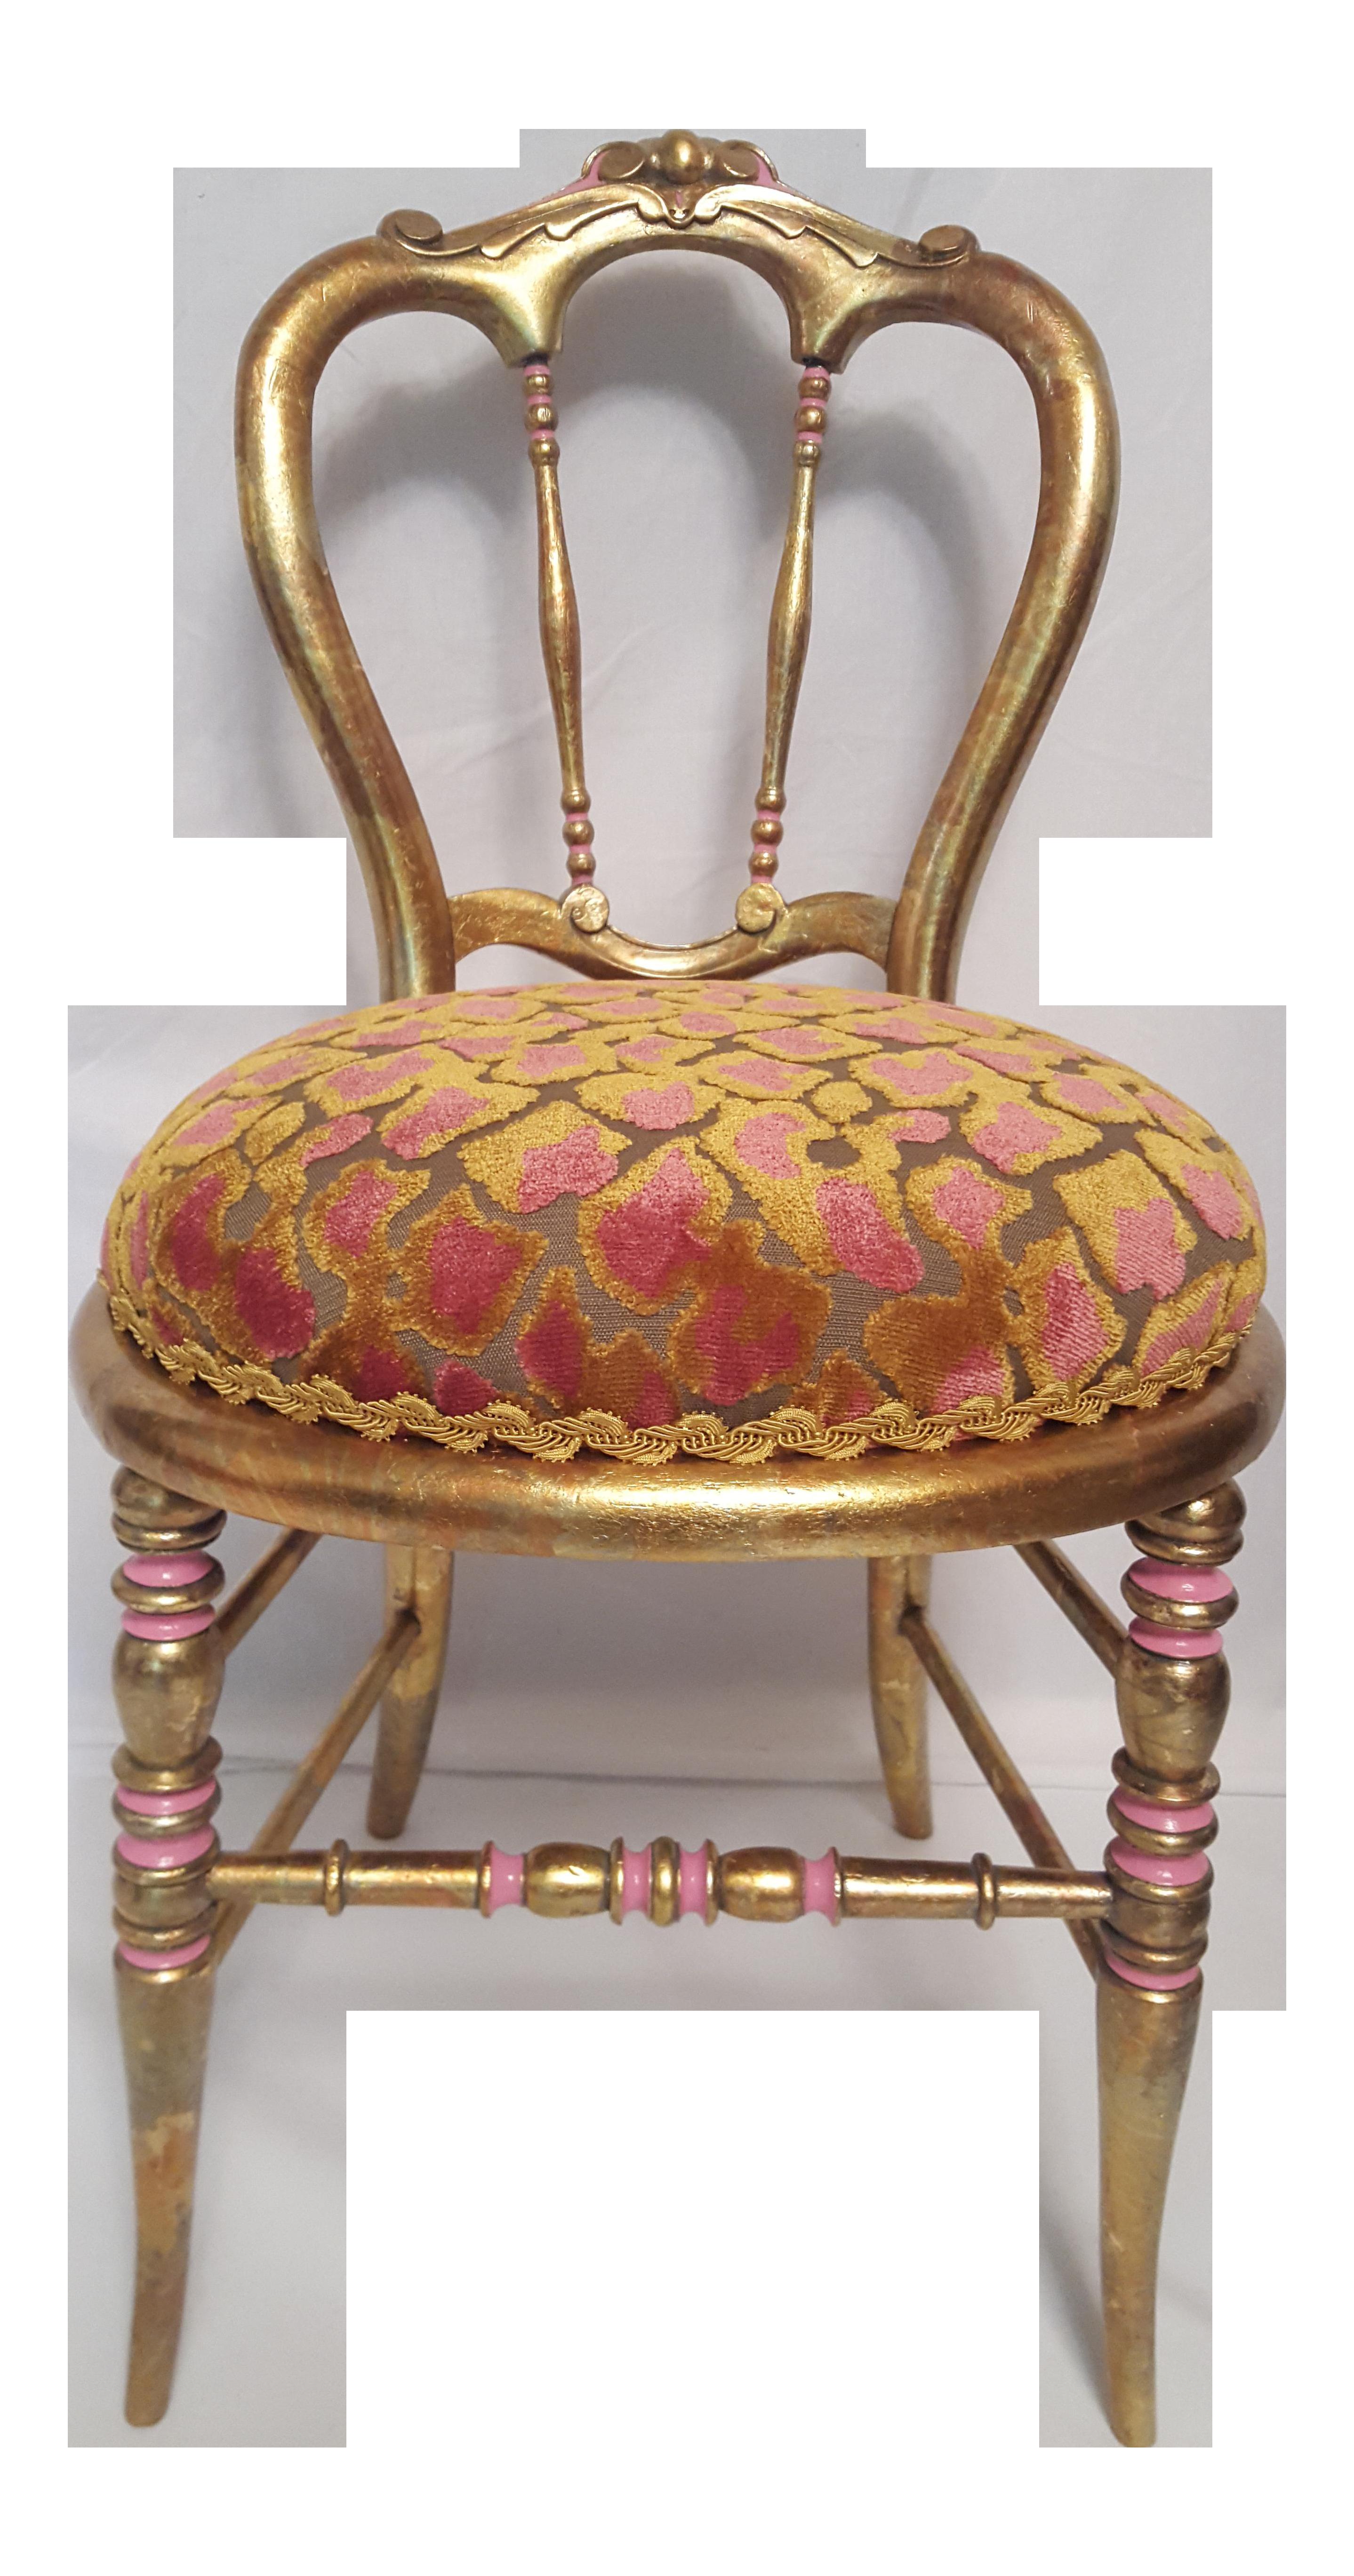 Lovely Gold Vanity Chair Rtty1 Com Rtty1 Com